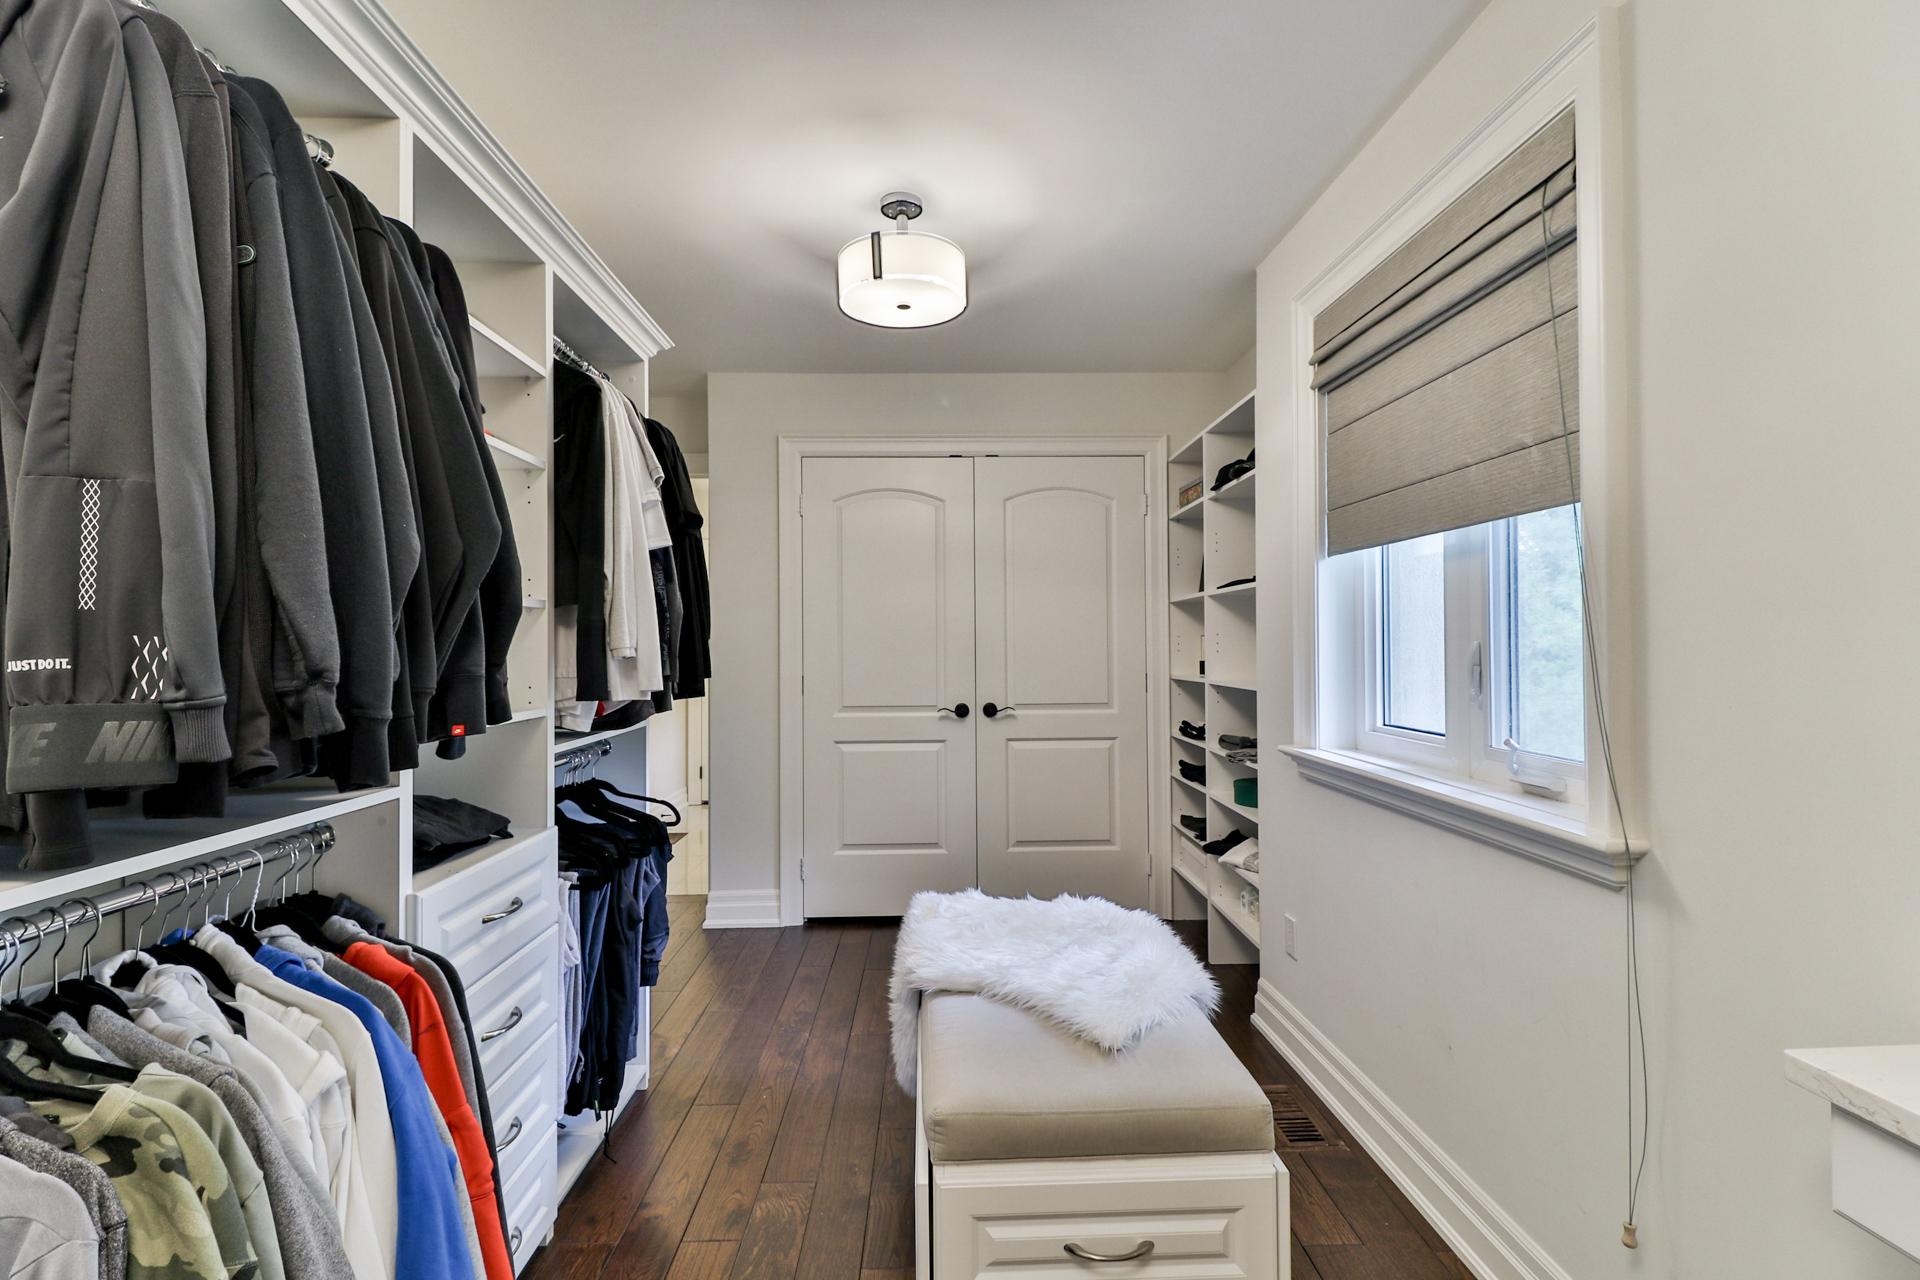 Master Bedroom Closet Interior, 149 Shaver, Etobicoke Home Staging